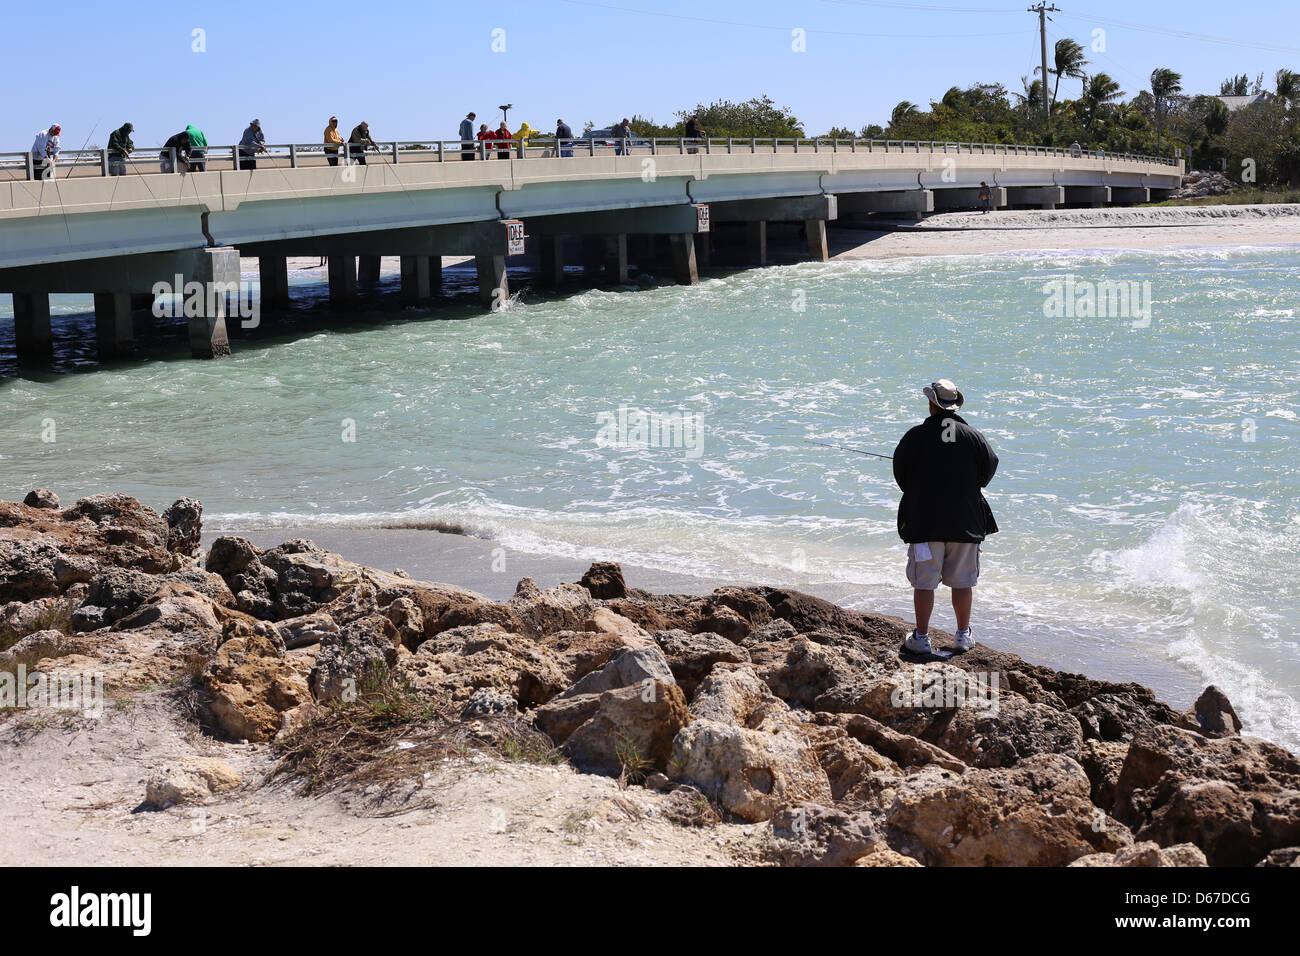 bridge and people fishing at Captiva Island, Florida, USA Stock Photo